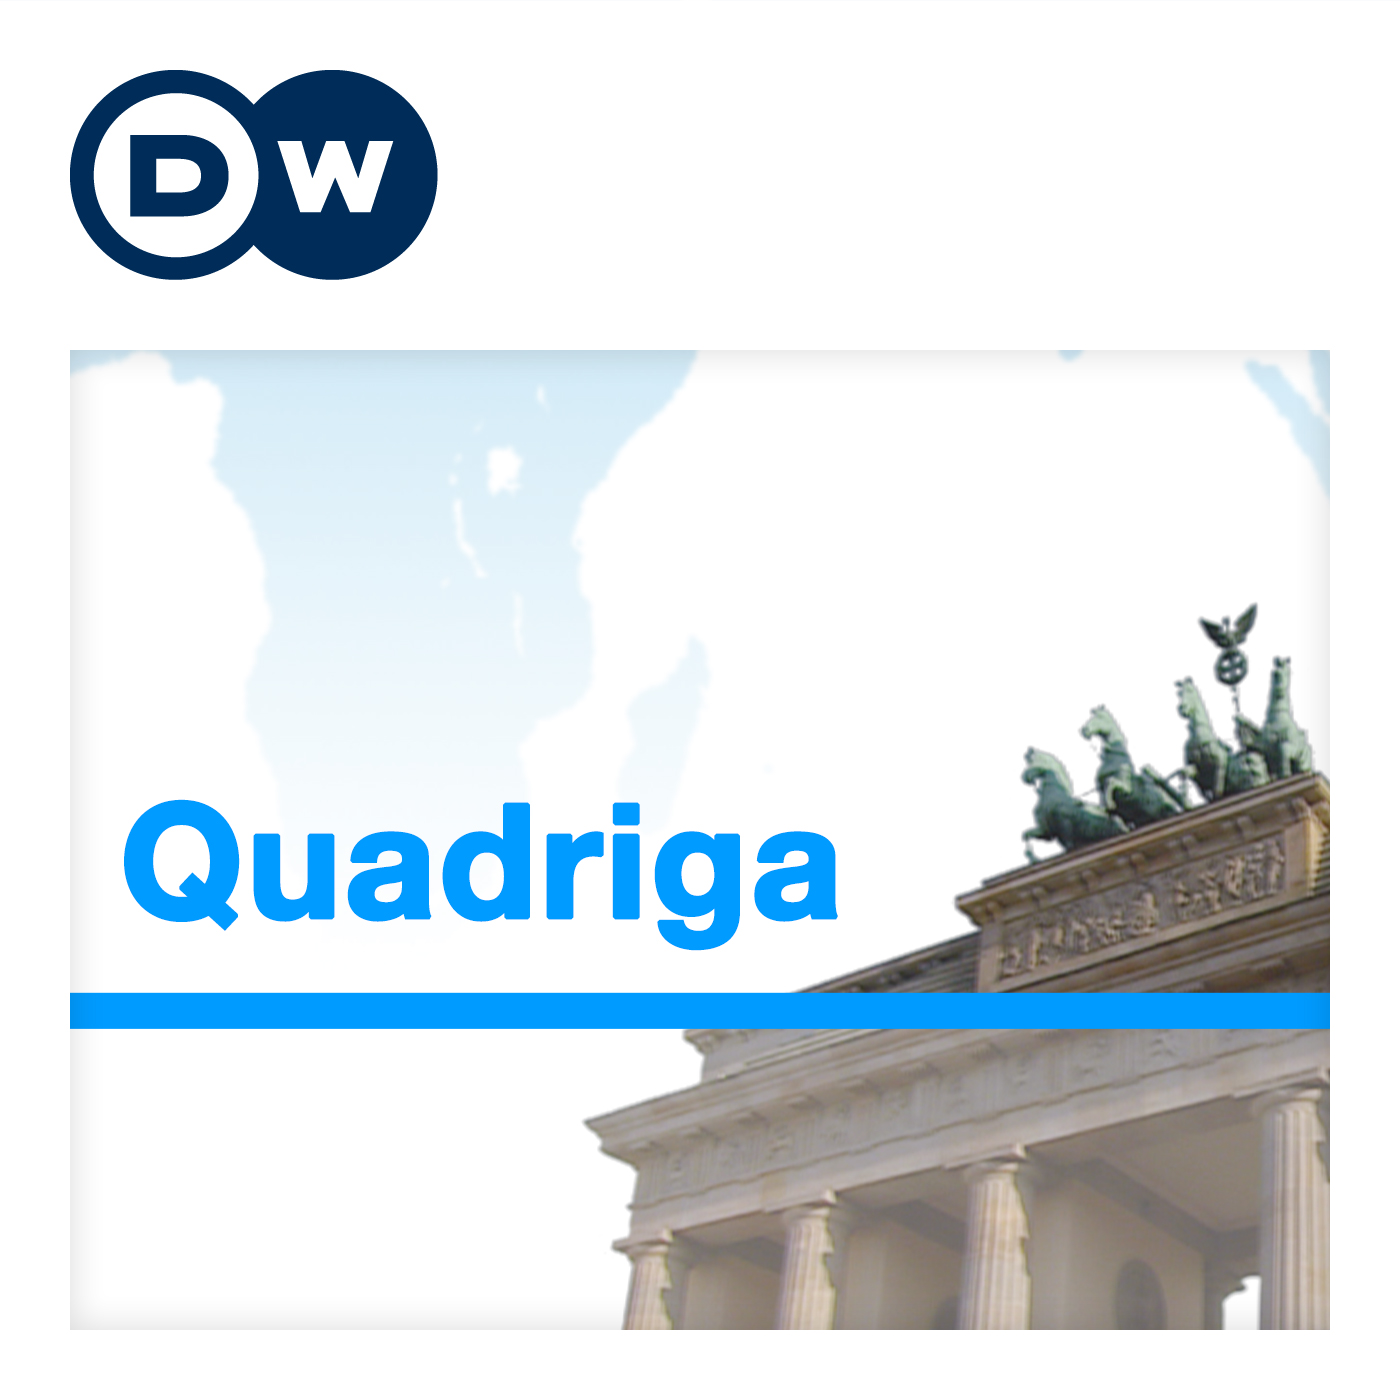 Quadriga: The International Talk Show from Berlin